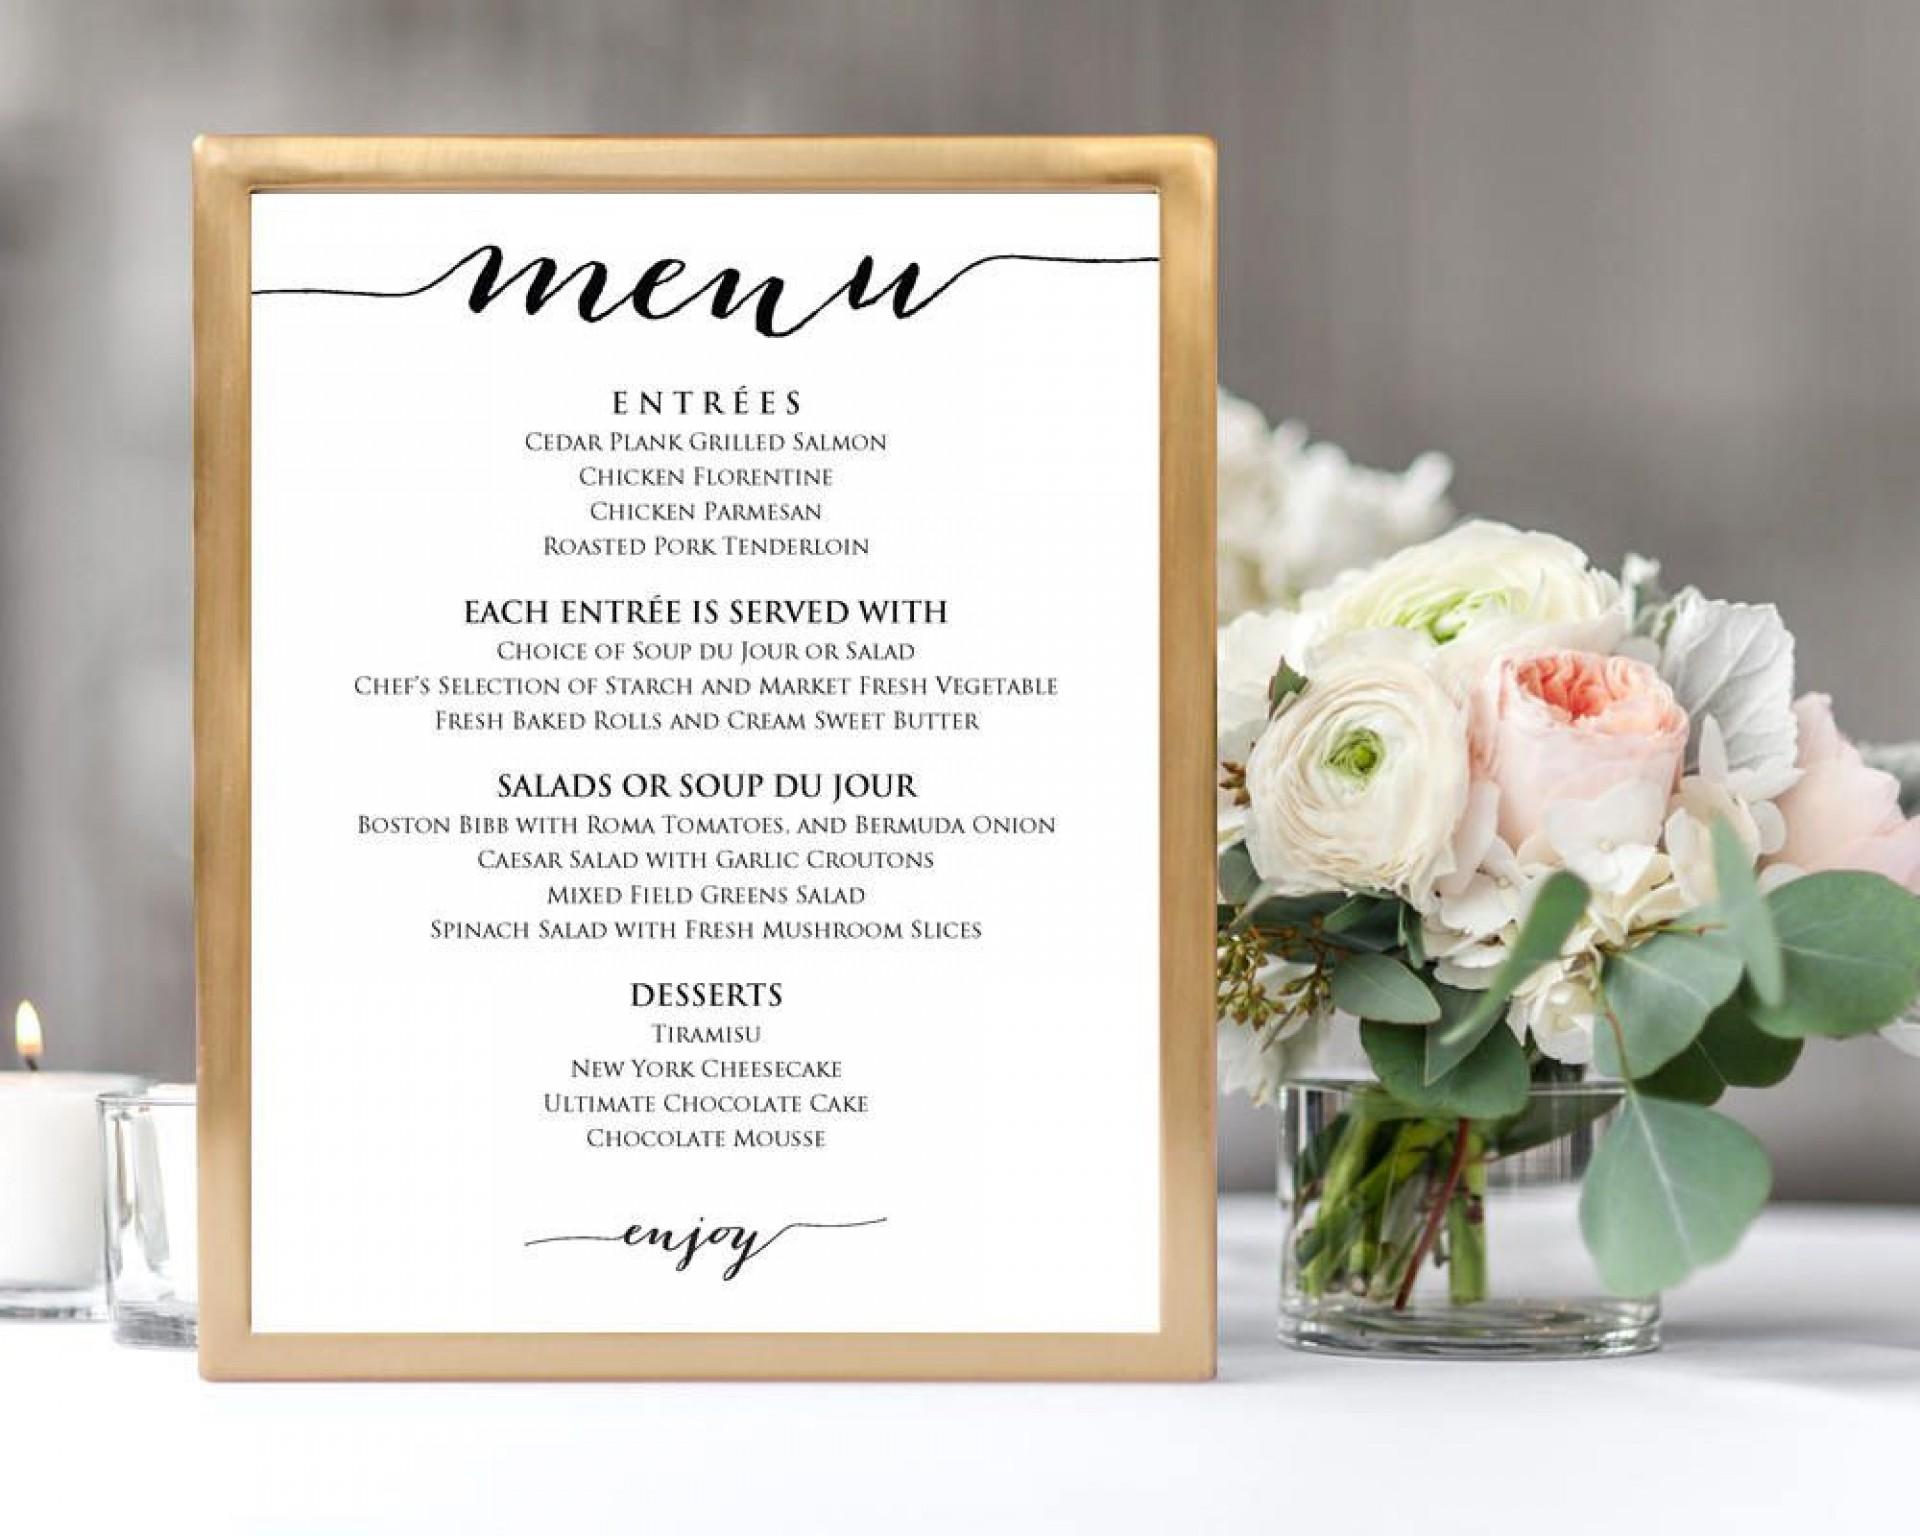 009 Sensational Diy Wedding Menu Template Design  Free Card1920